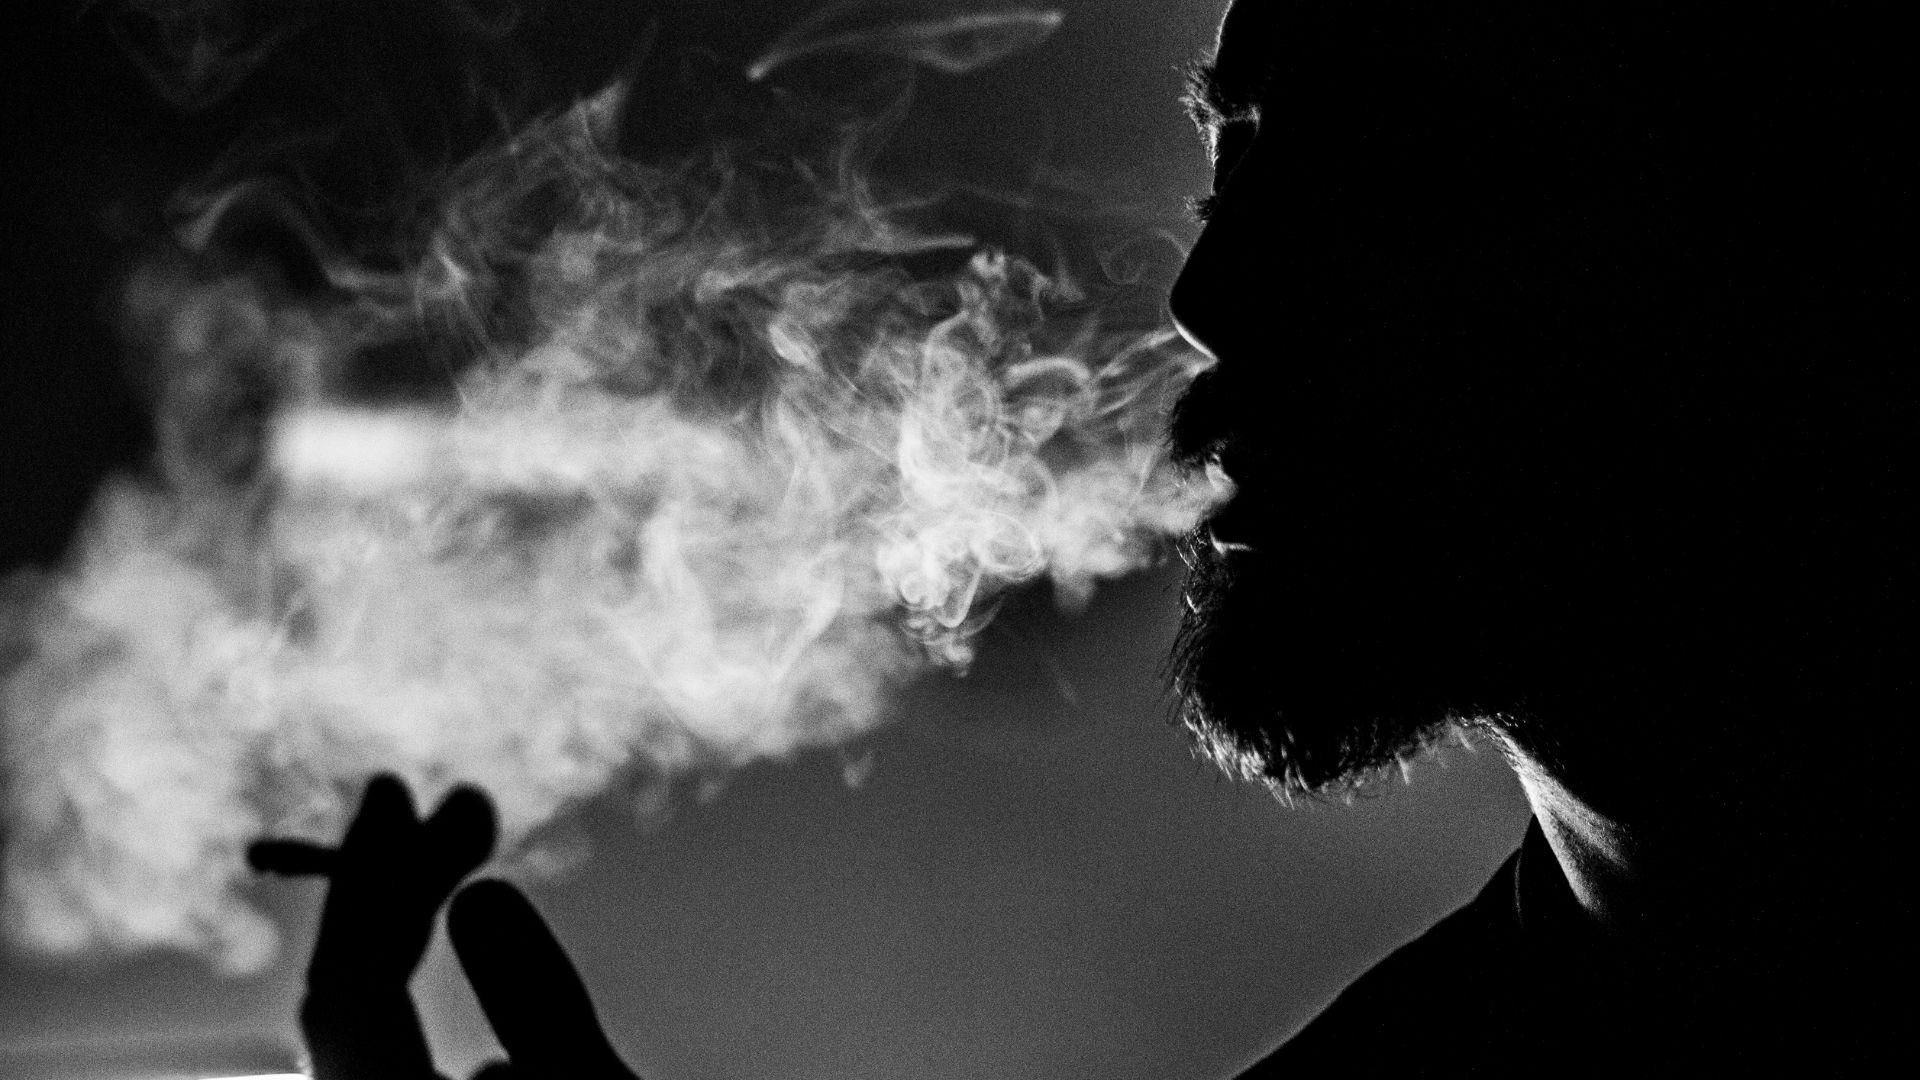 Fake Entspannung - Zigaretten Alkohol Drogen